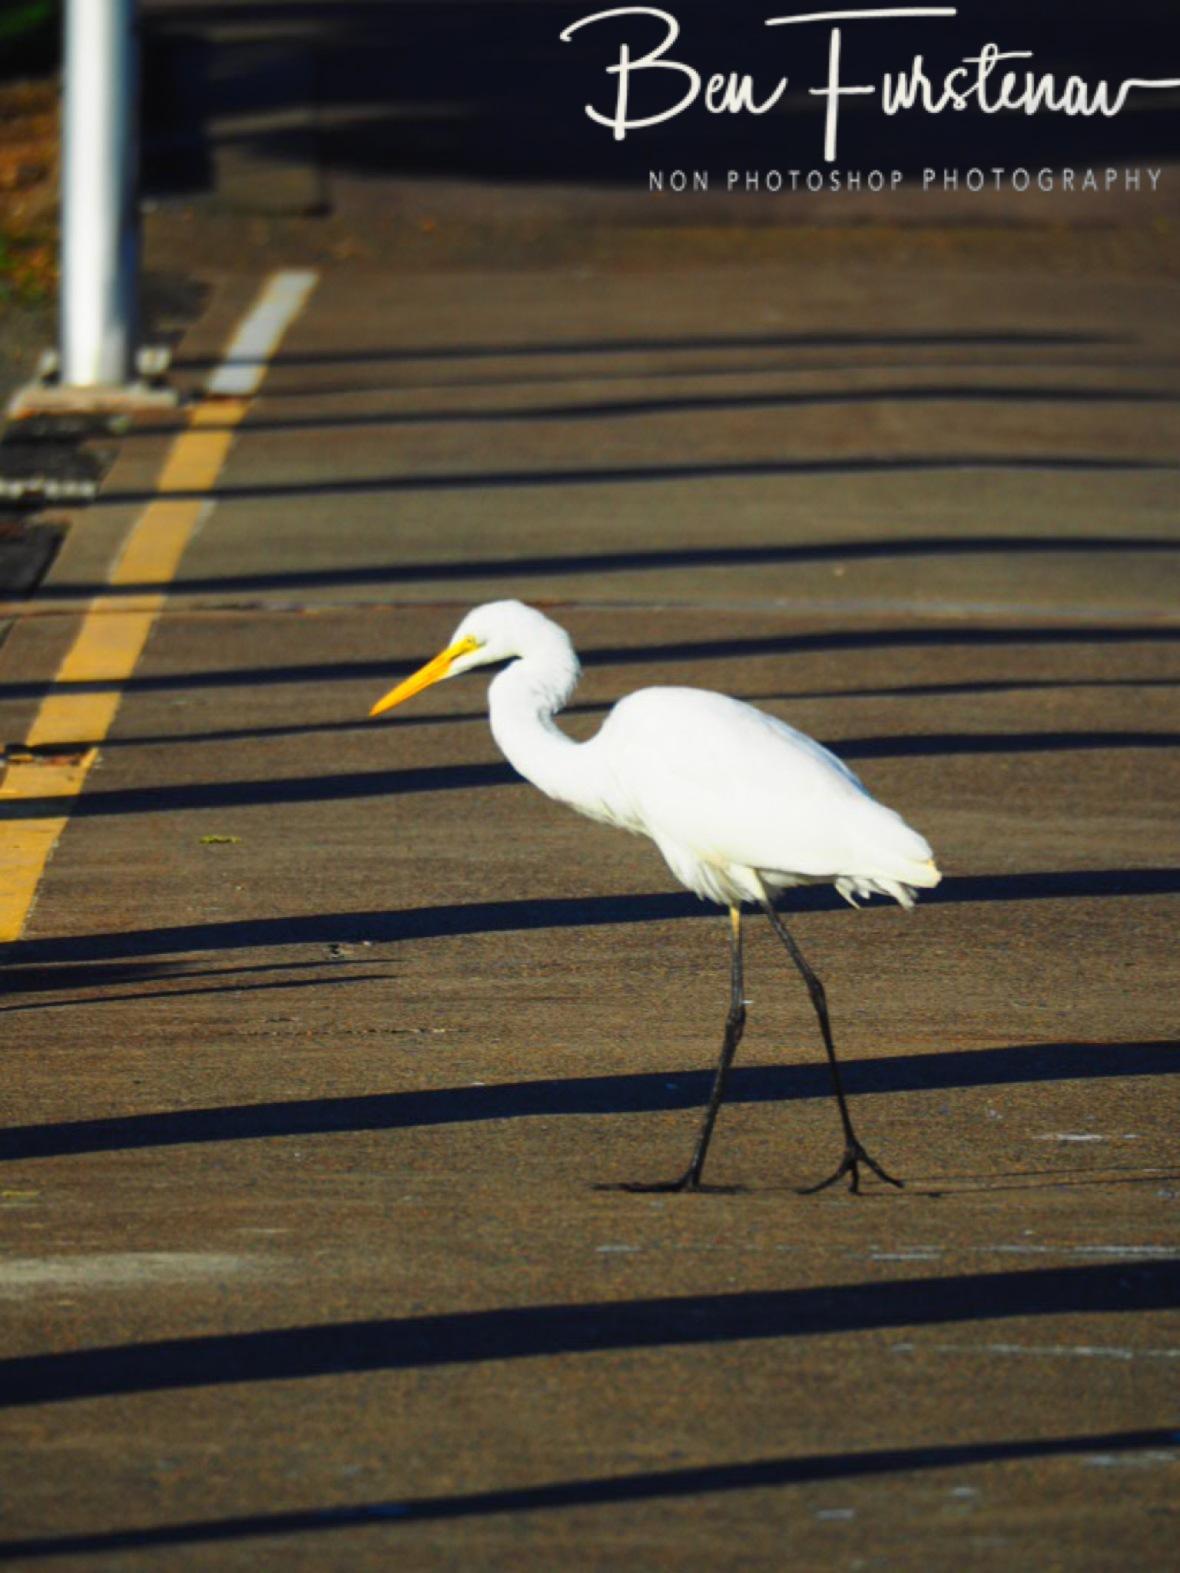 Jetty stalker @ Crowdy Head, Northern New South Wales, Australia